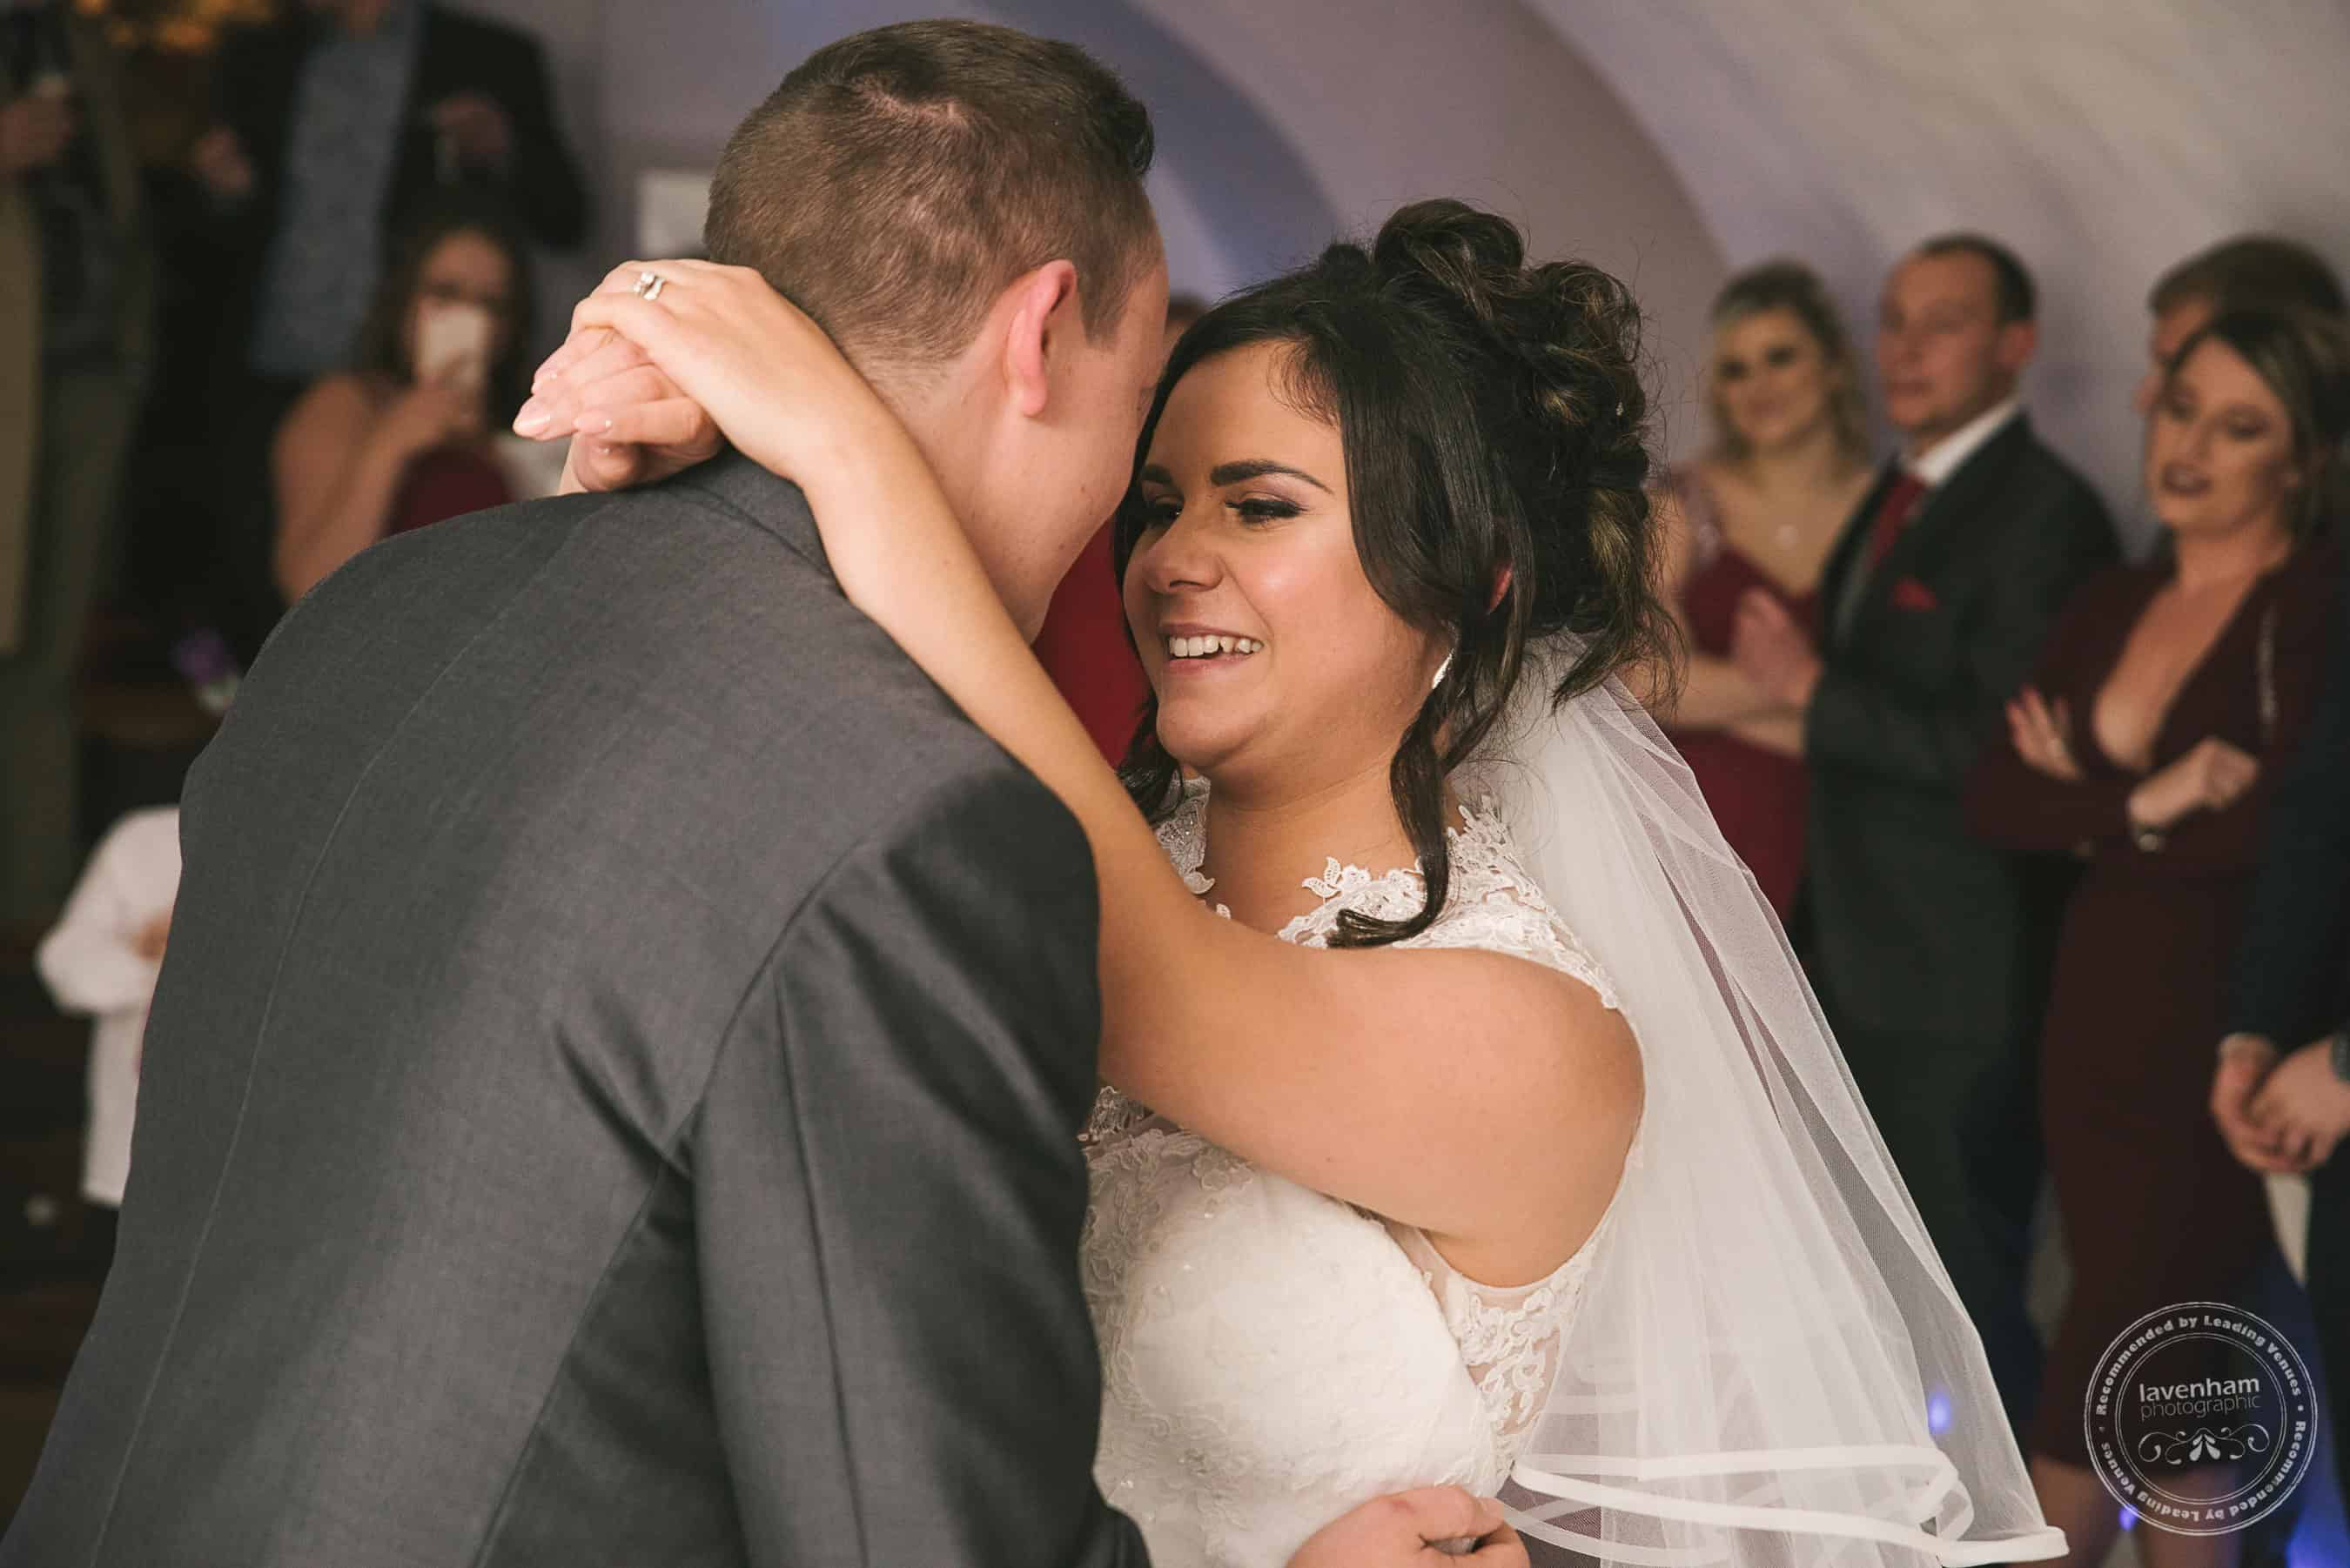 251118 Leez Priory Wedding Photography by Lavenham Photographic 119